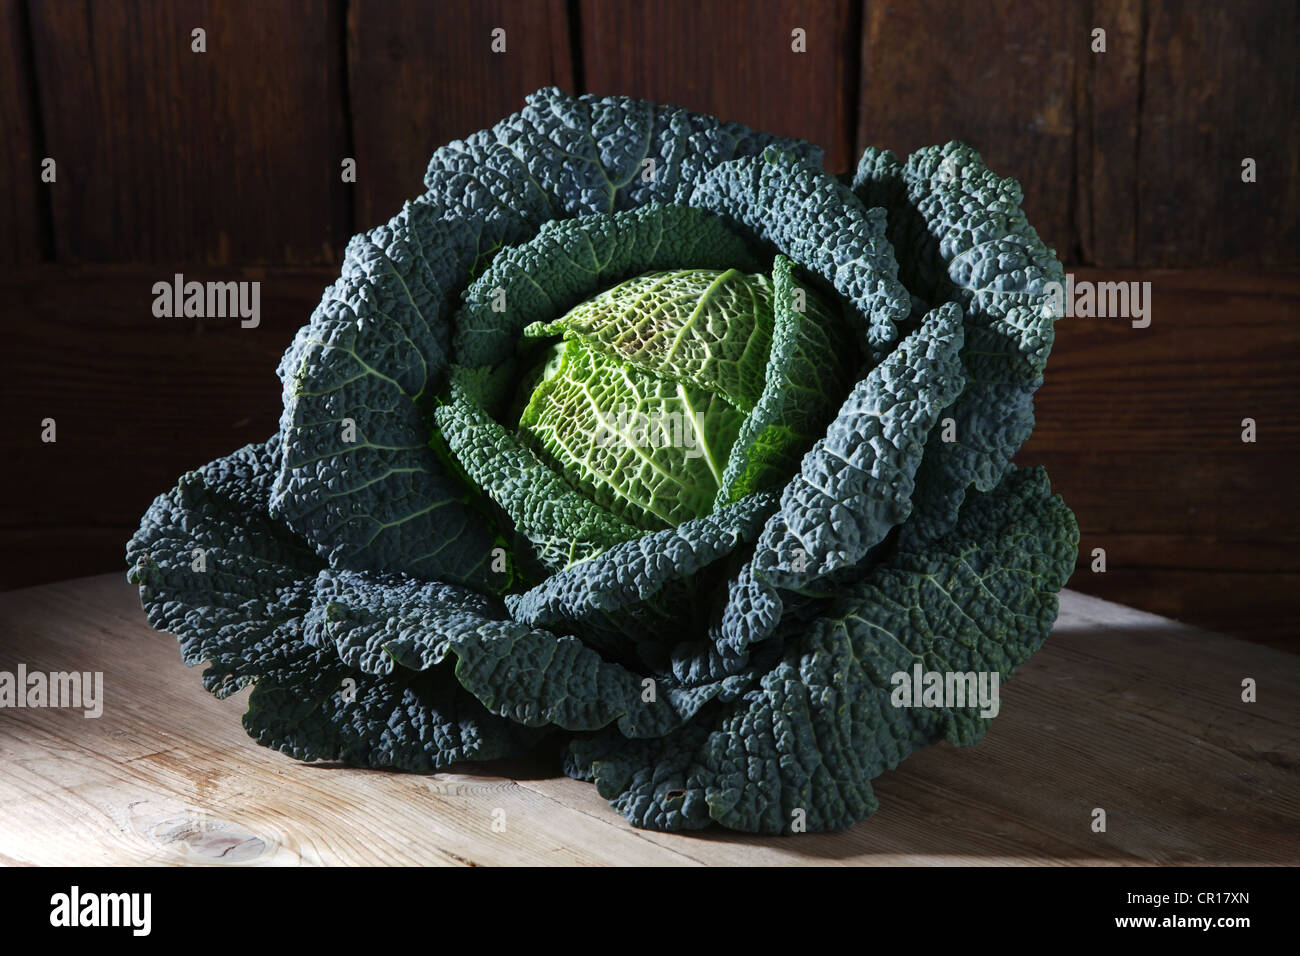 Savoy cabbage (Brassica oleracea convar. Capitata var. sabauda L.), on a rustic wooden surface Stock Photo